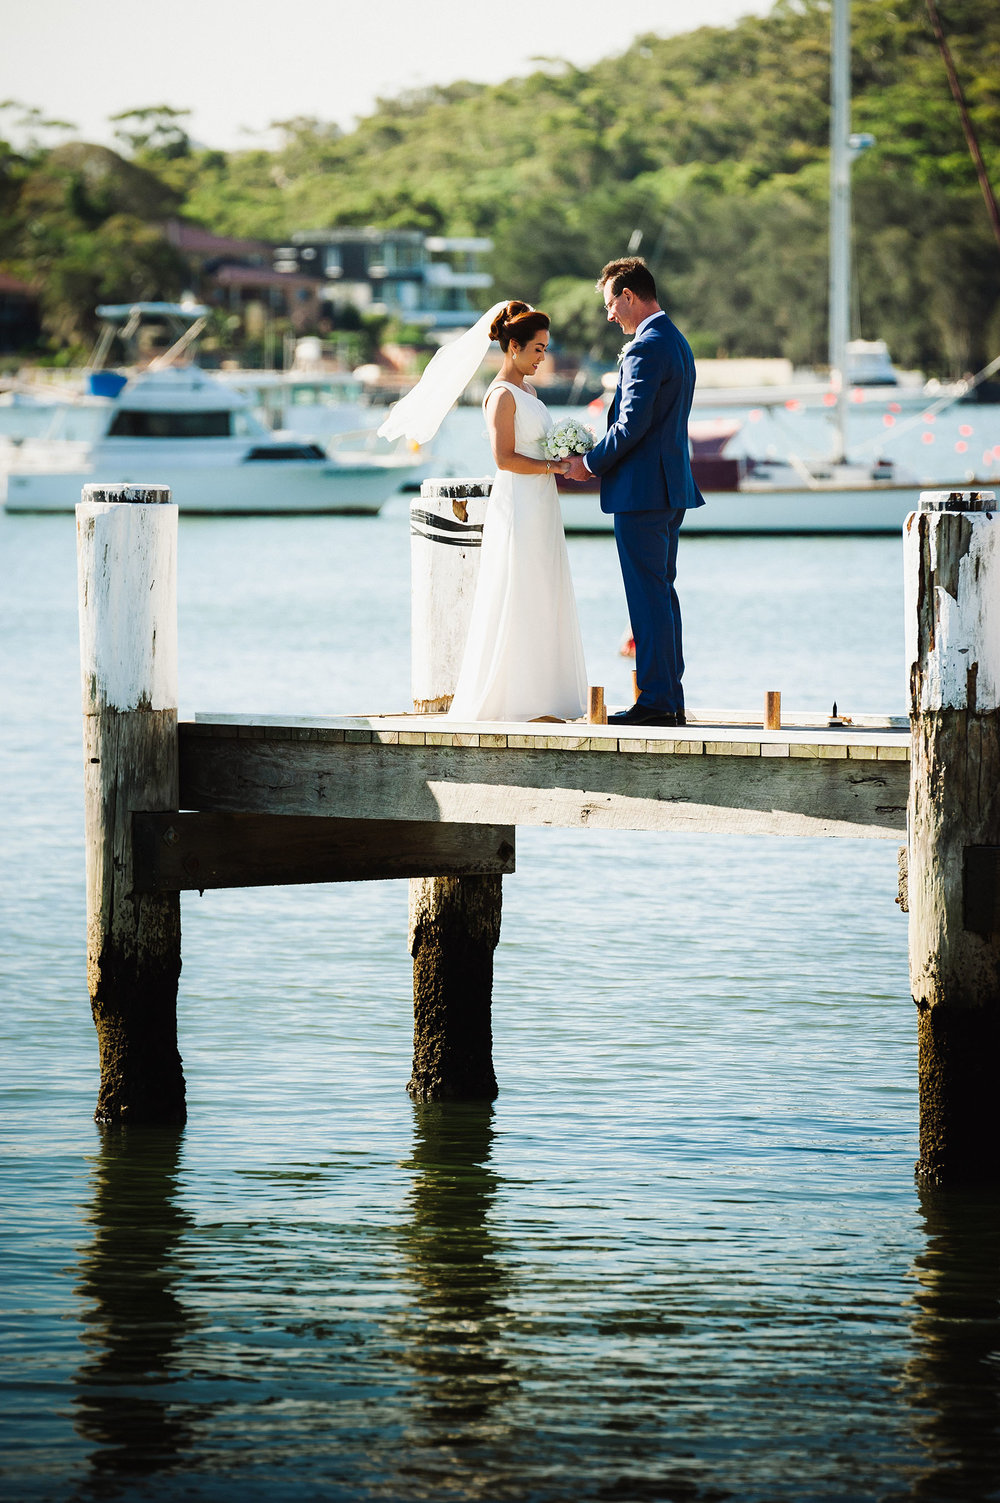 Marryme_wedding_photography_dorrigo_bellingen_photographer_30.jpg